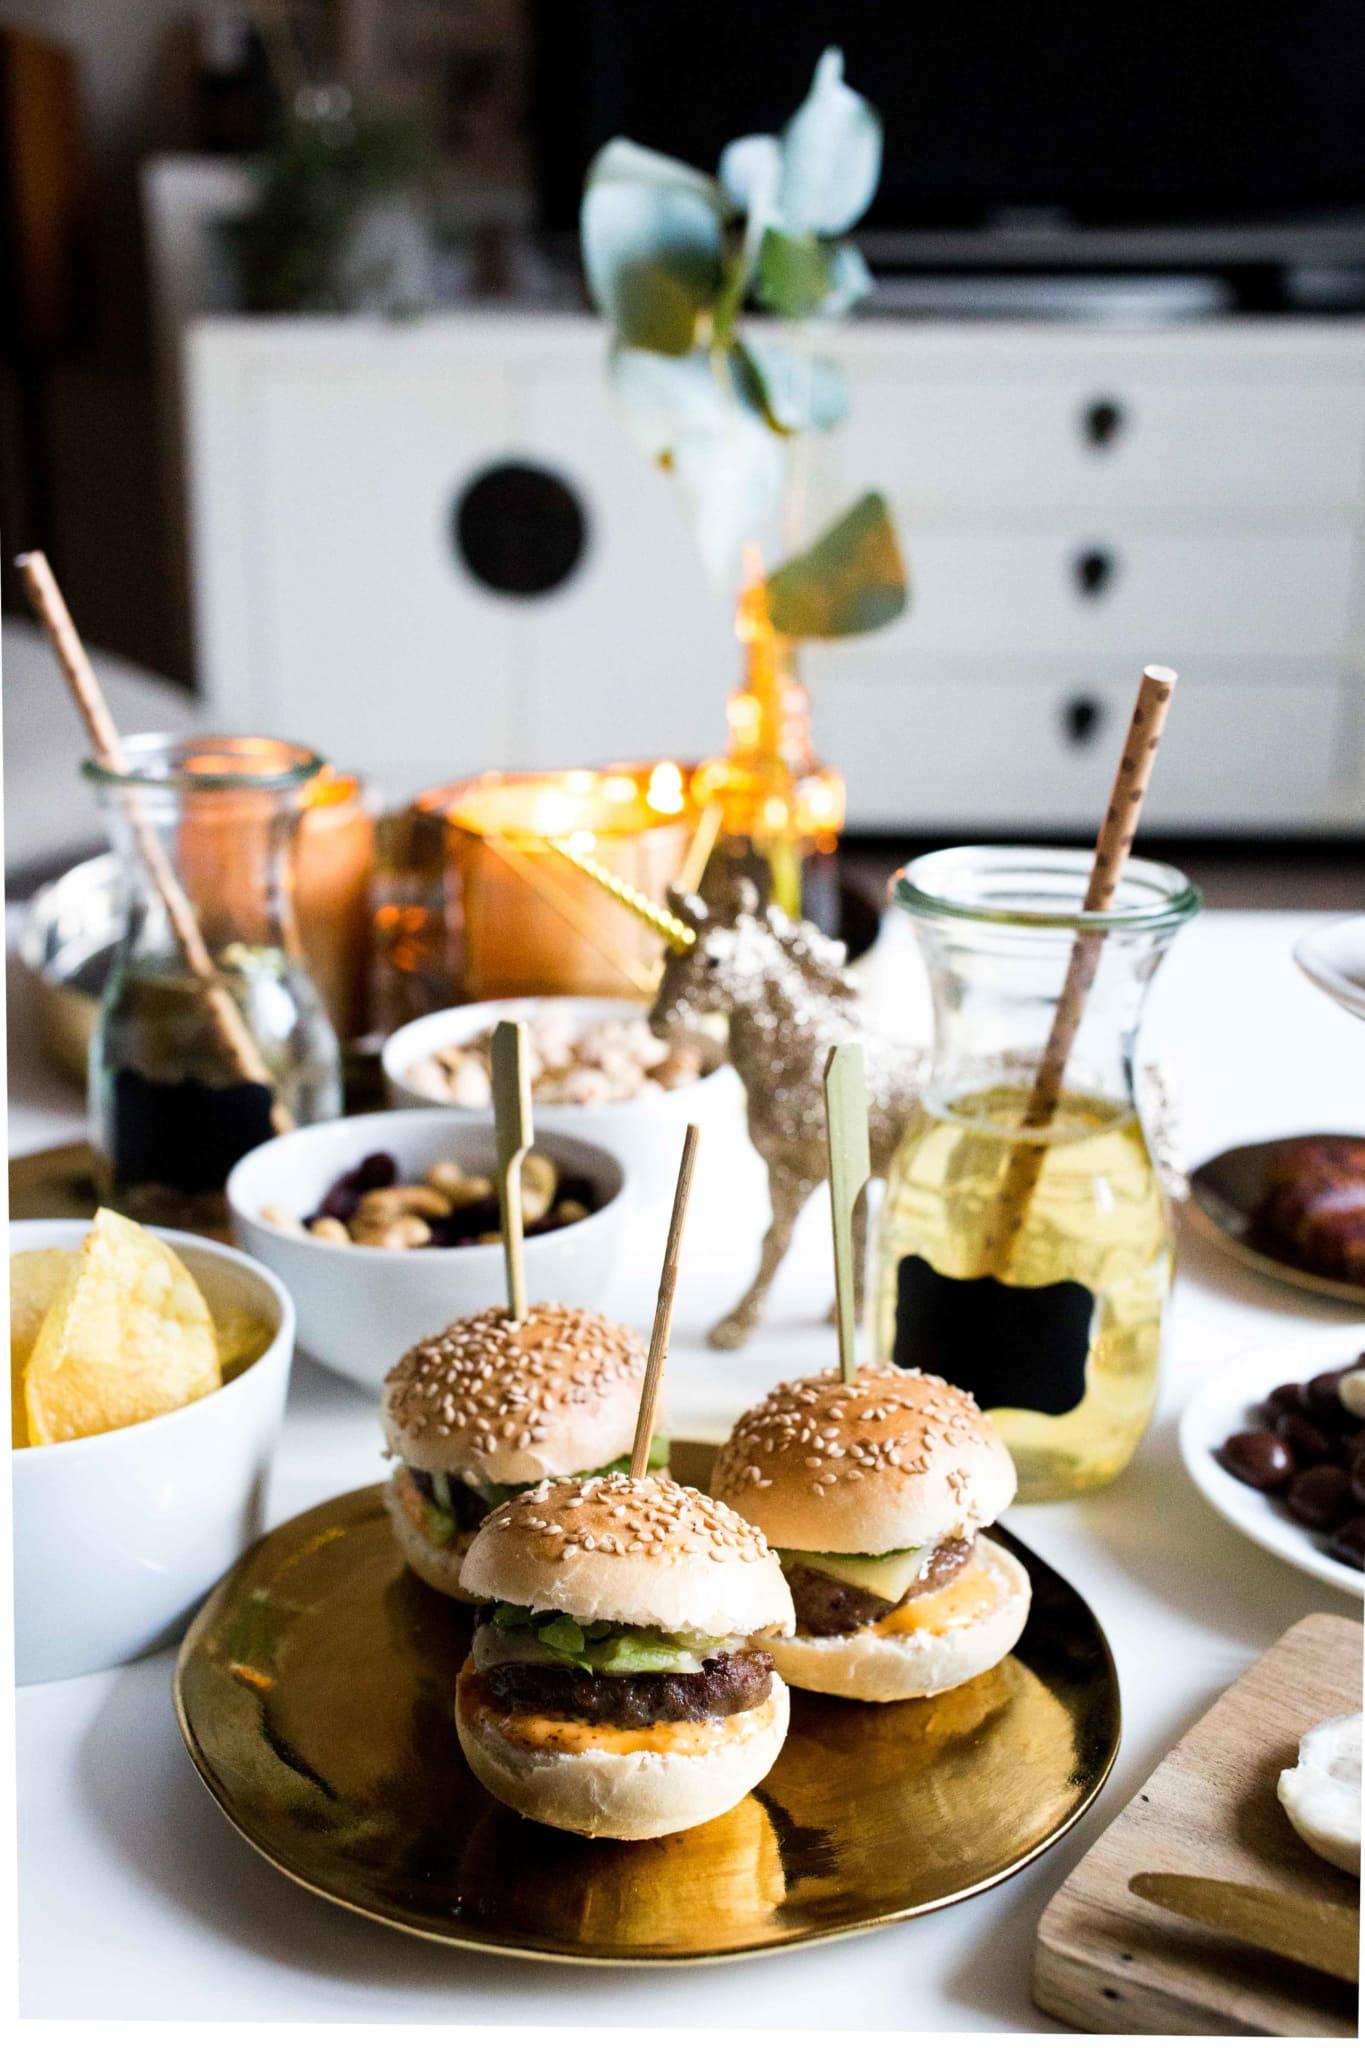 lidl delicieux voorpret 1 2 1 - Recept mini hambugers